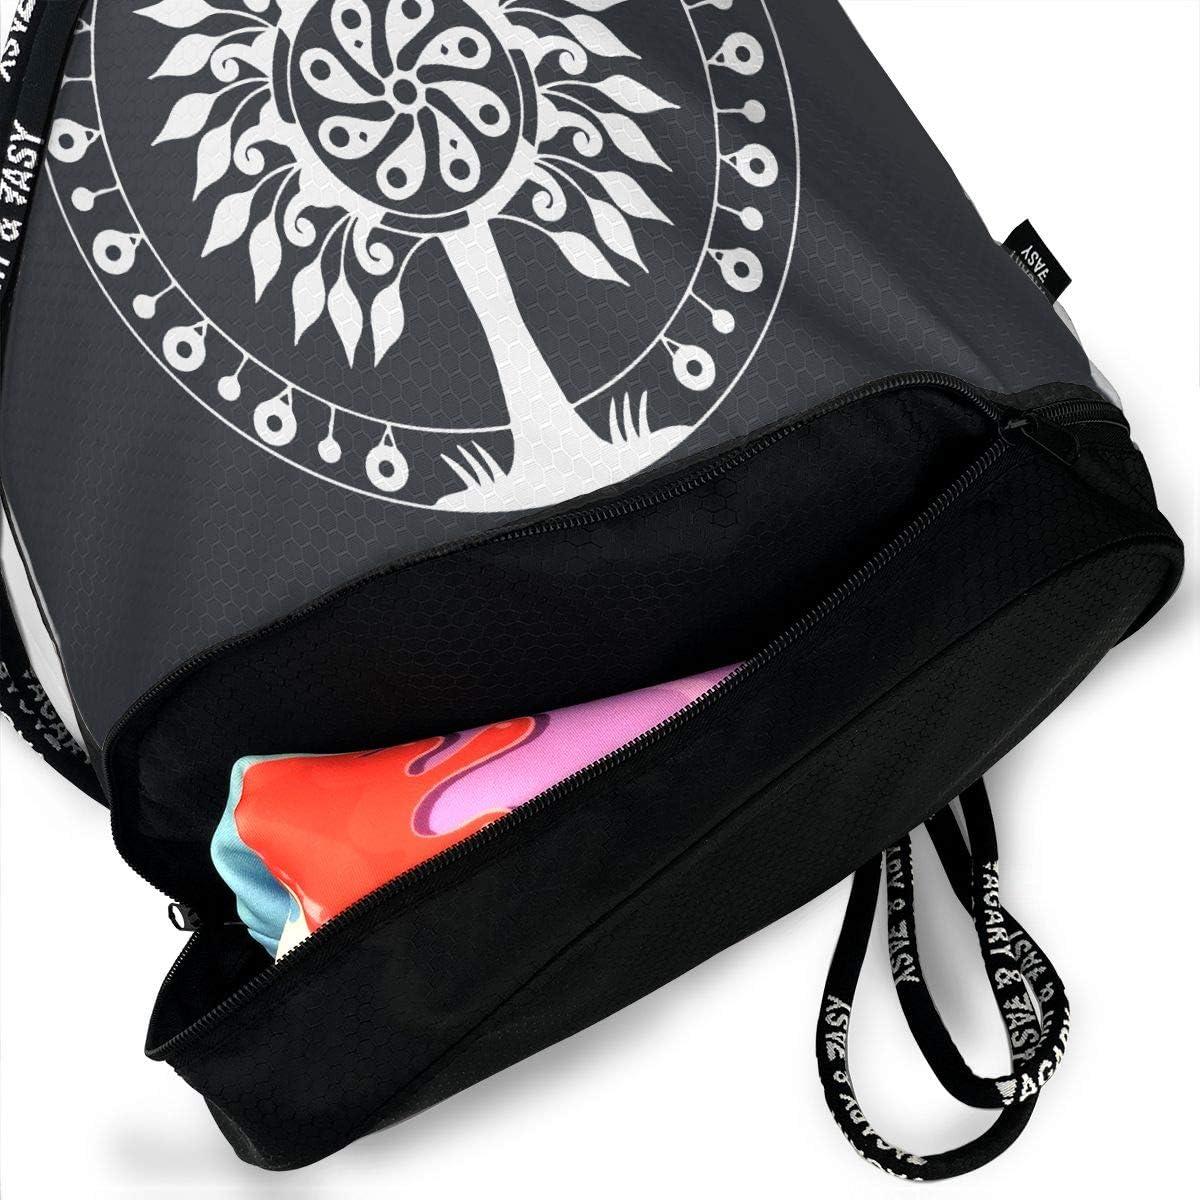 Tree Men /& Women Drawstring Pack Beam Mouth Sports Sackpack Rucksack Shoulder Bags